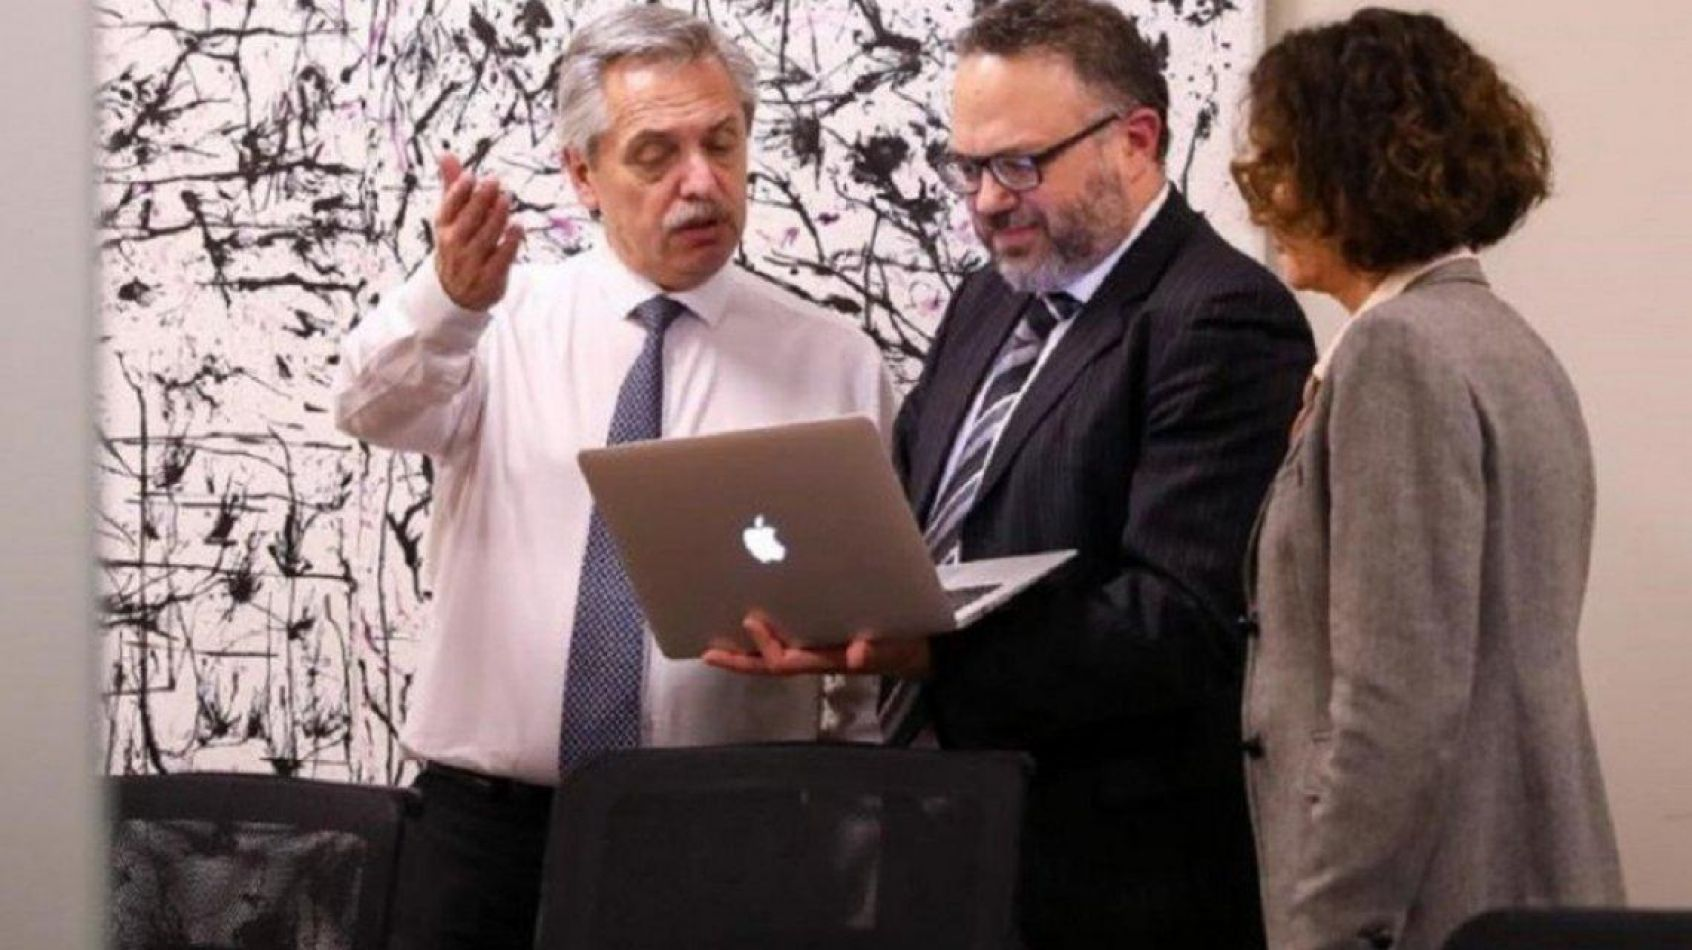 Foto: diario26.com. Alberto Fernández junto a Matías Kulfas, posible ministro de Economía